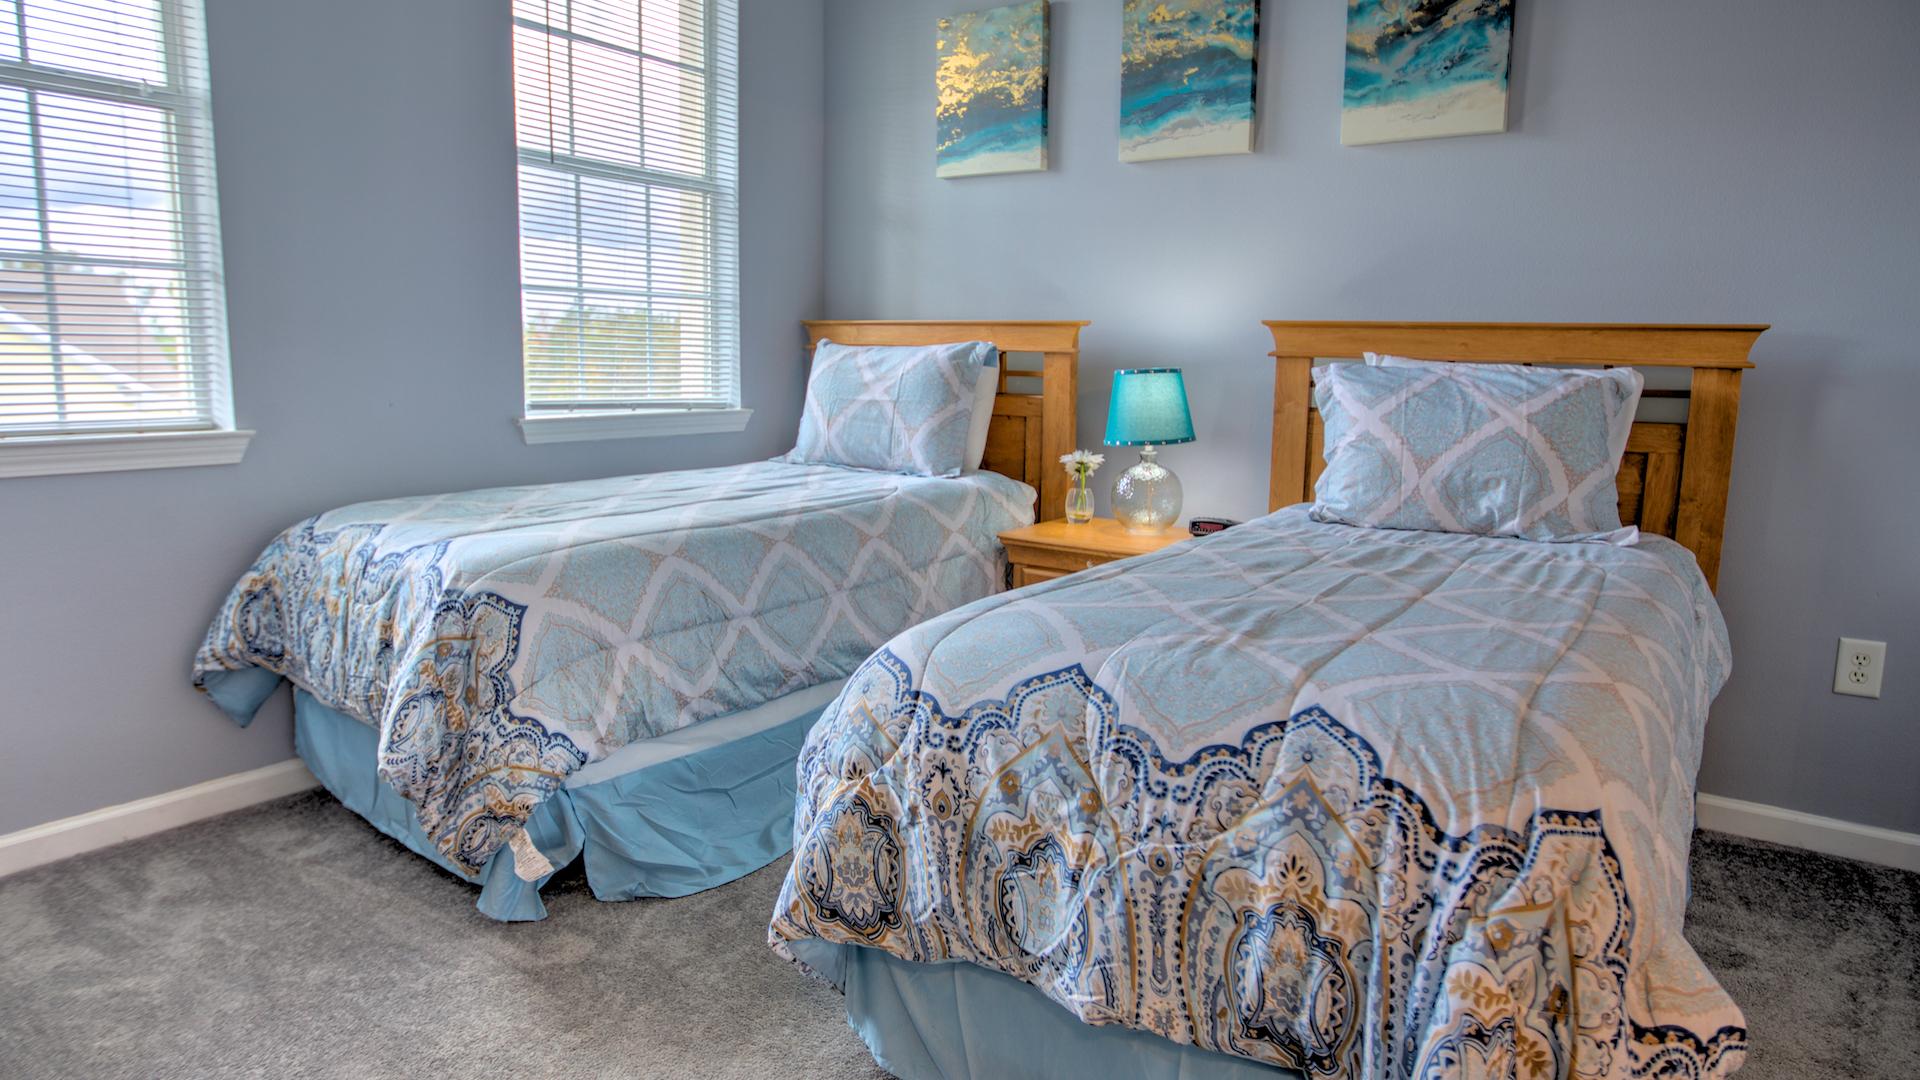 Apartment Cayman Condo at Cane Island Resort photo 25857799